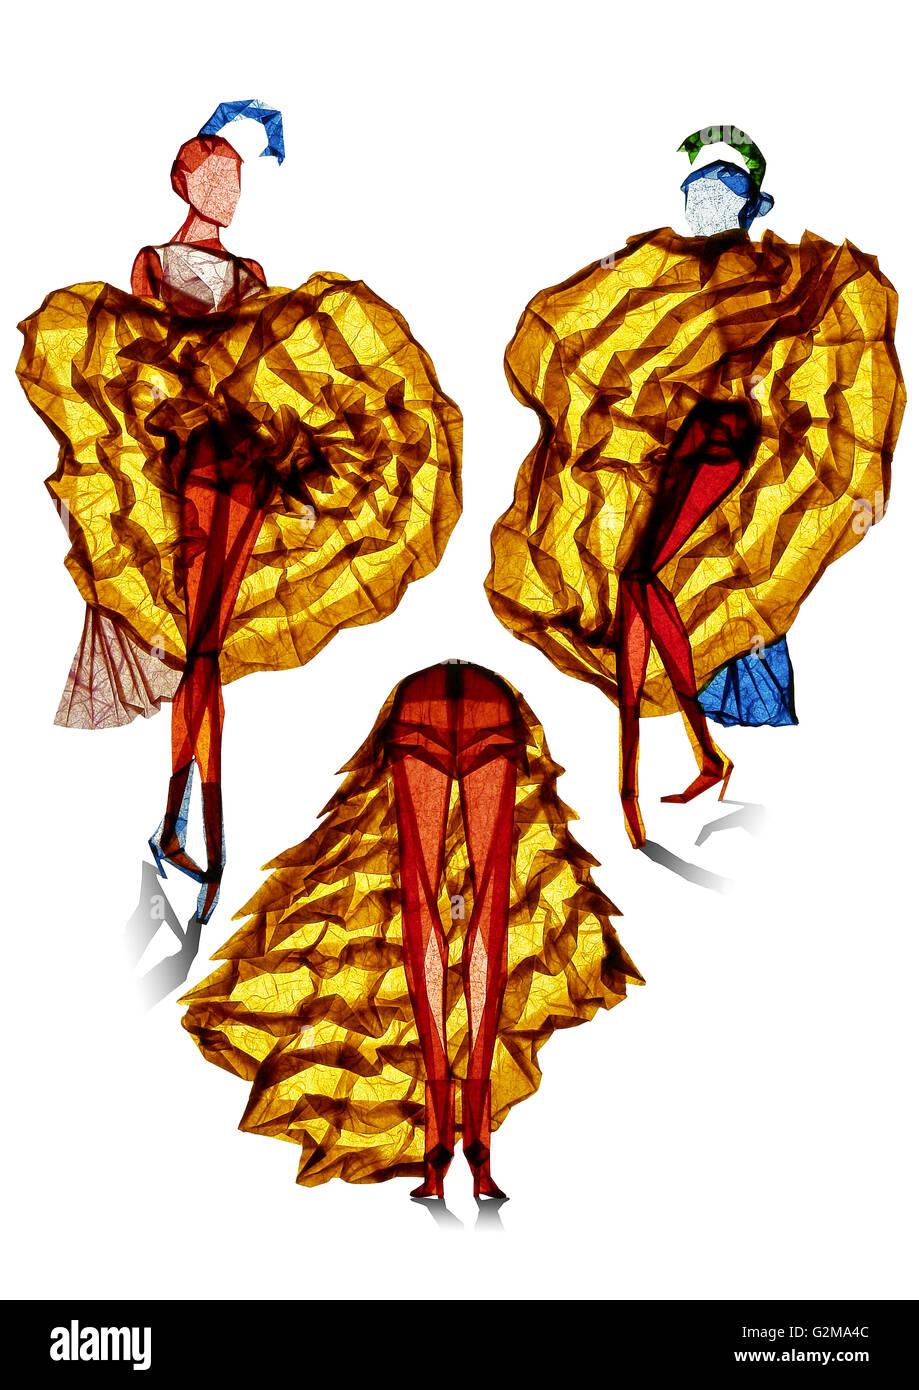 Women in long skirts - Stock Image